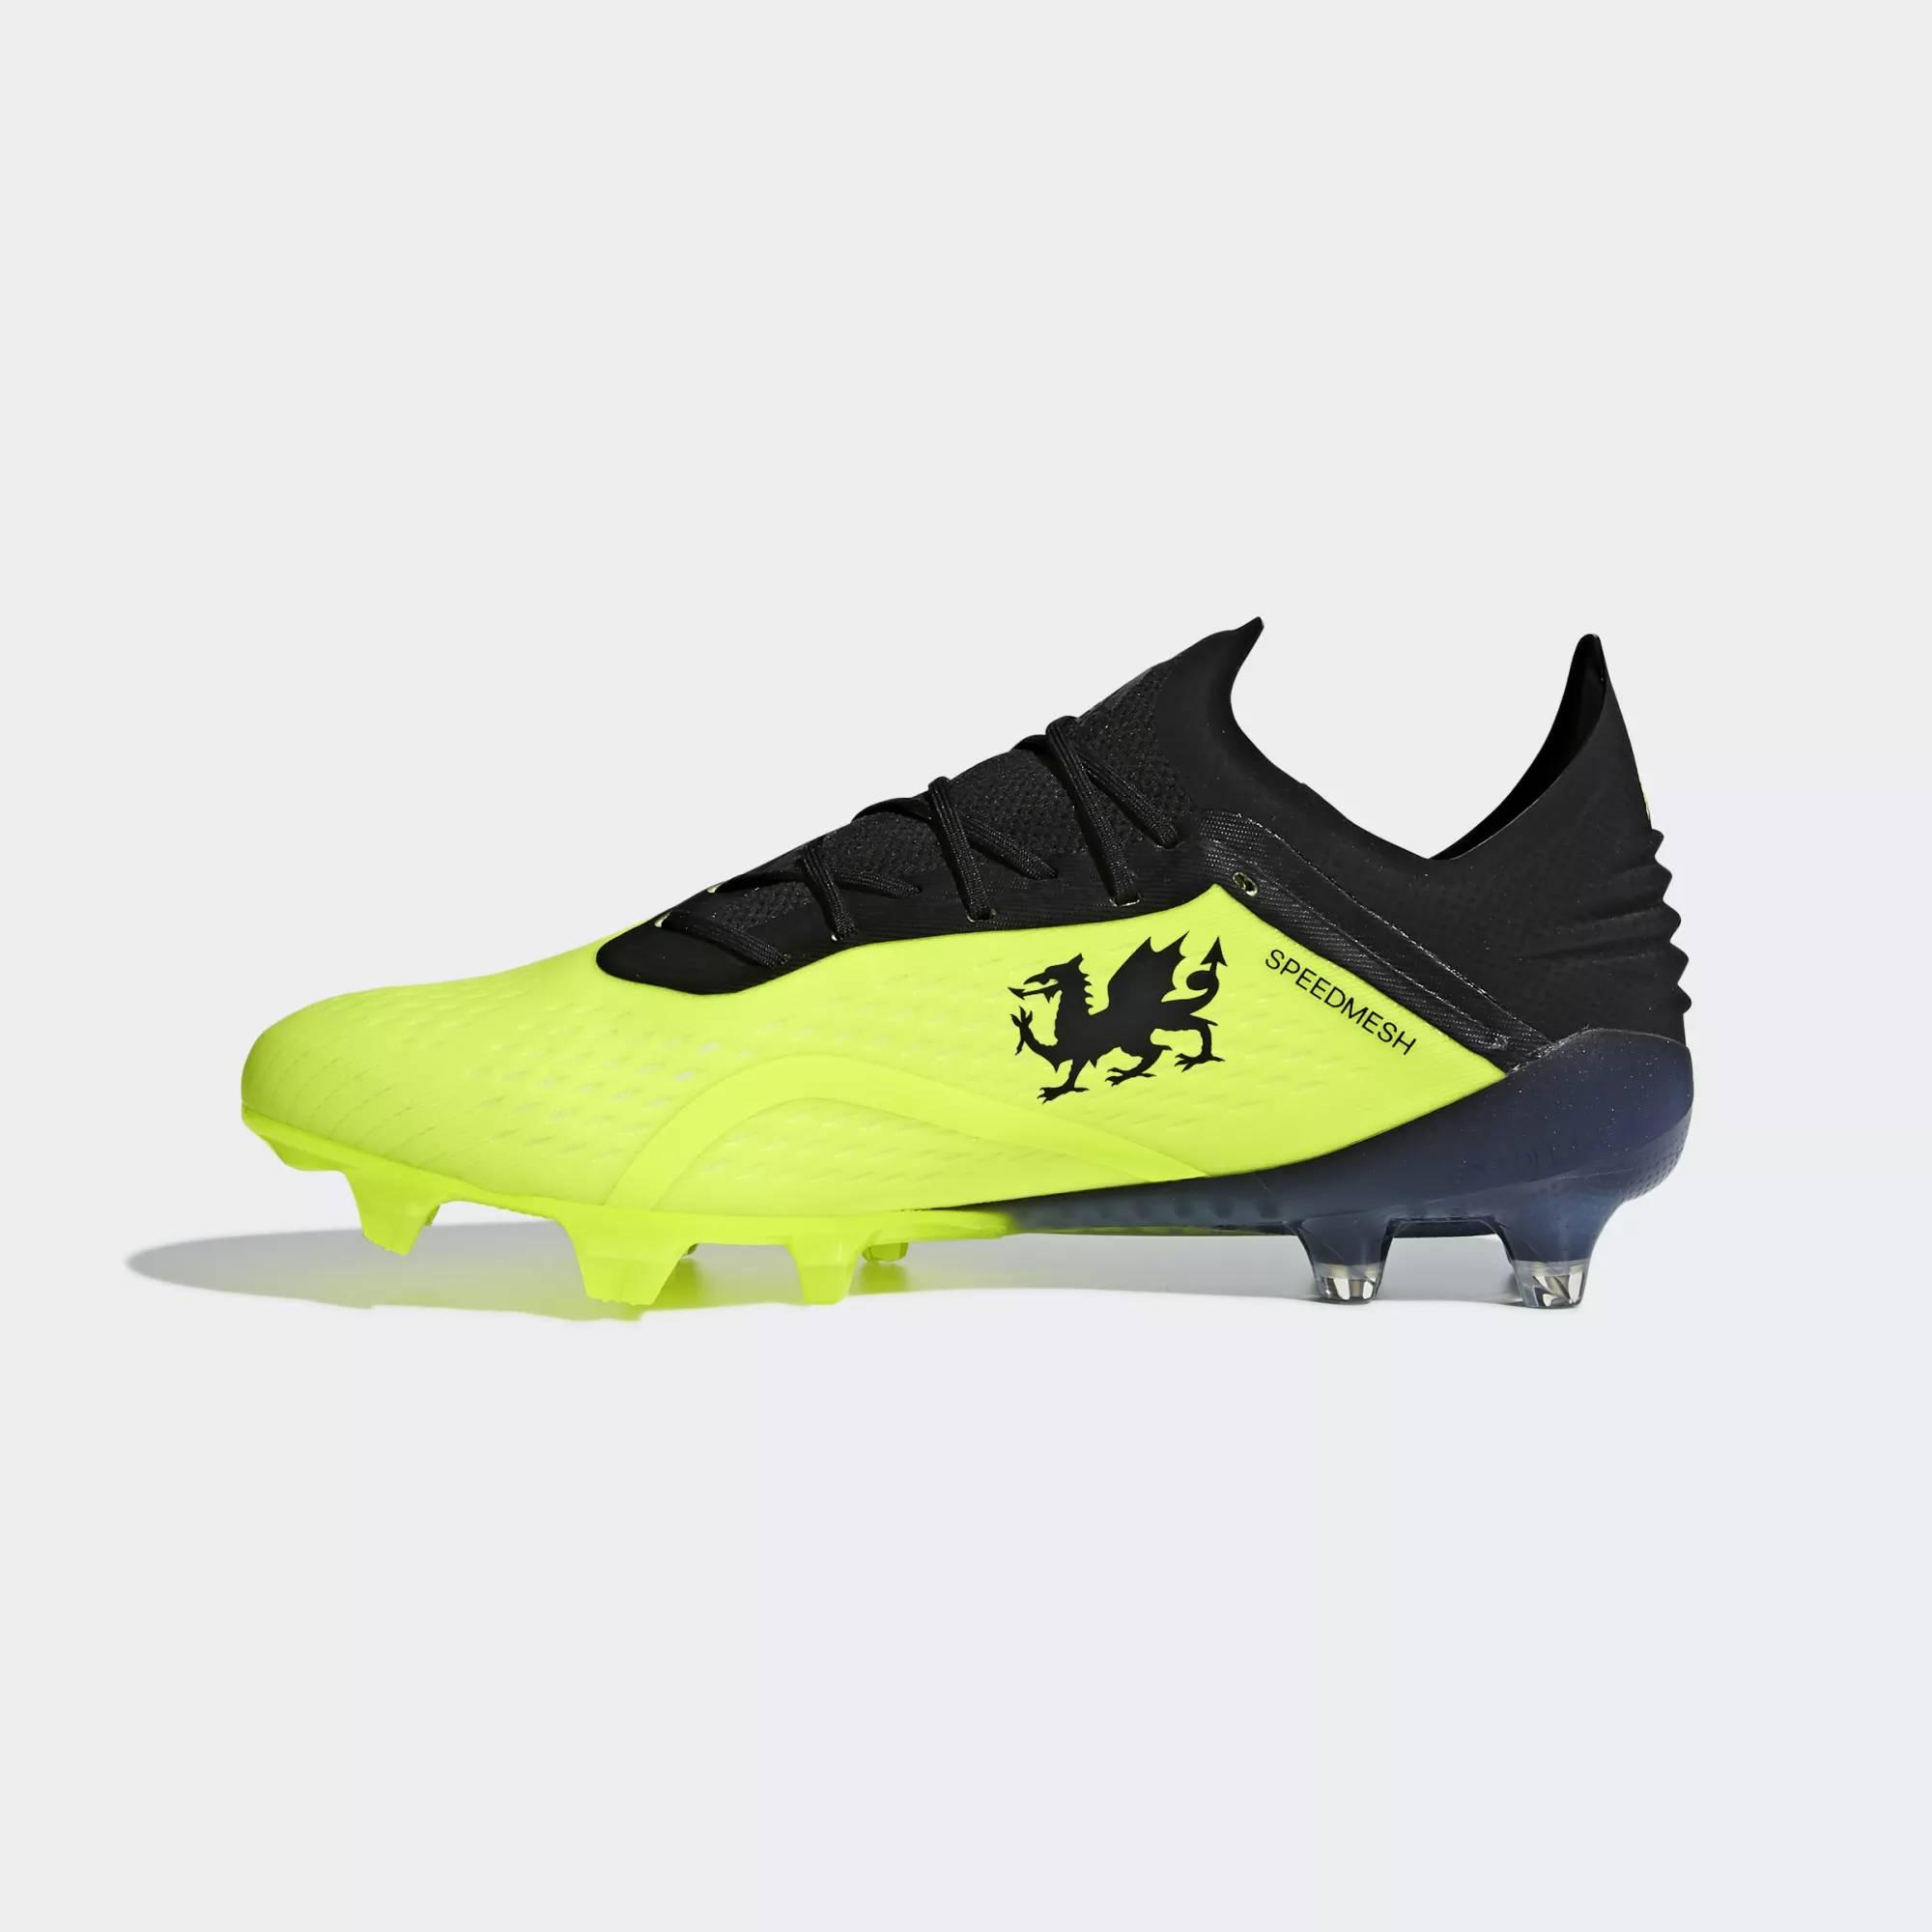 04ae0da17d6 ... Click to enlarge image  adidas_x18_1_firm_ground_gareth_bale_boots_solar_yellow_core_black_ftwr_white_g.jpg  ...